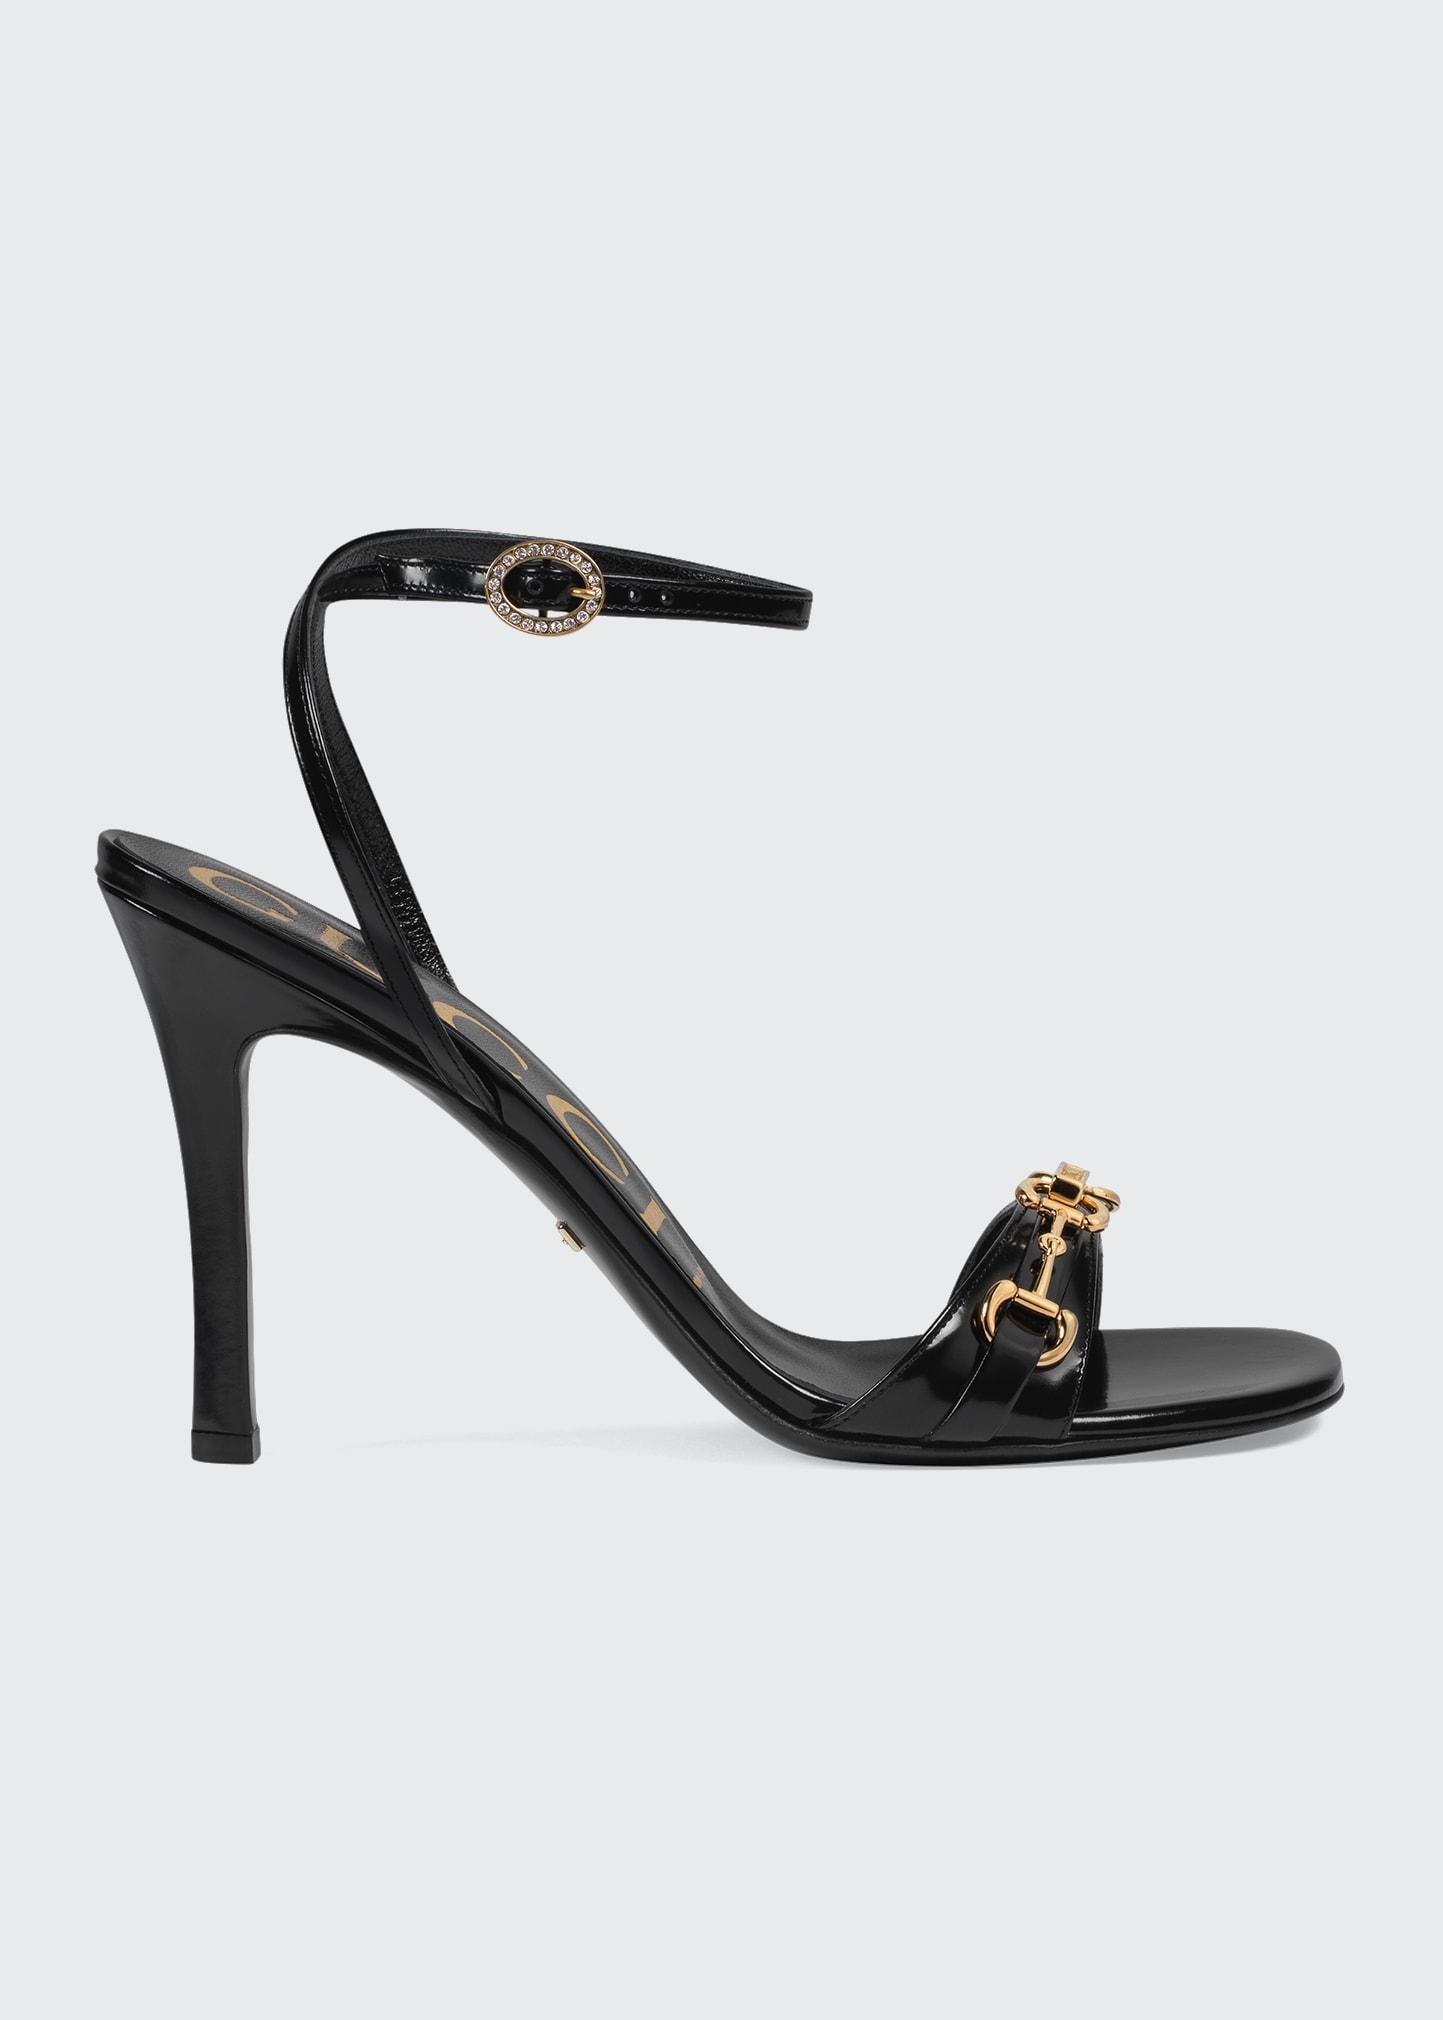 Gucci High heels MOOREA LEATHER SANDALS WITH HORSEBIT